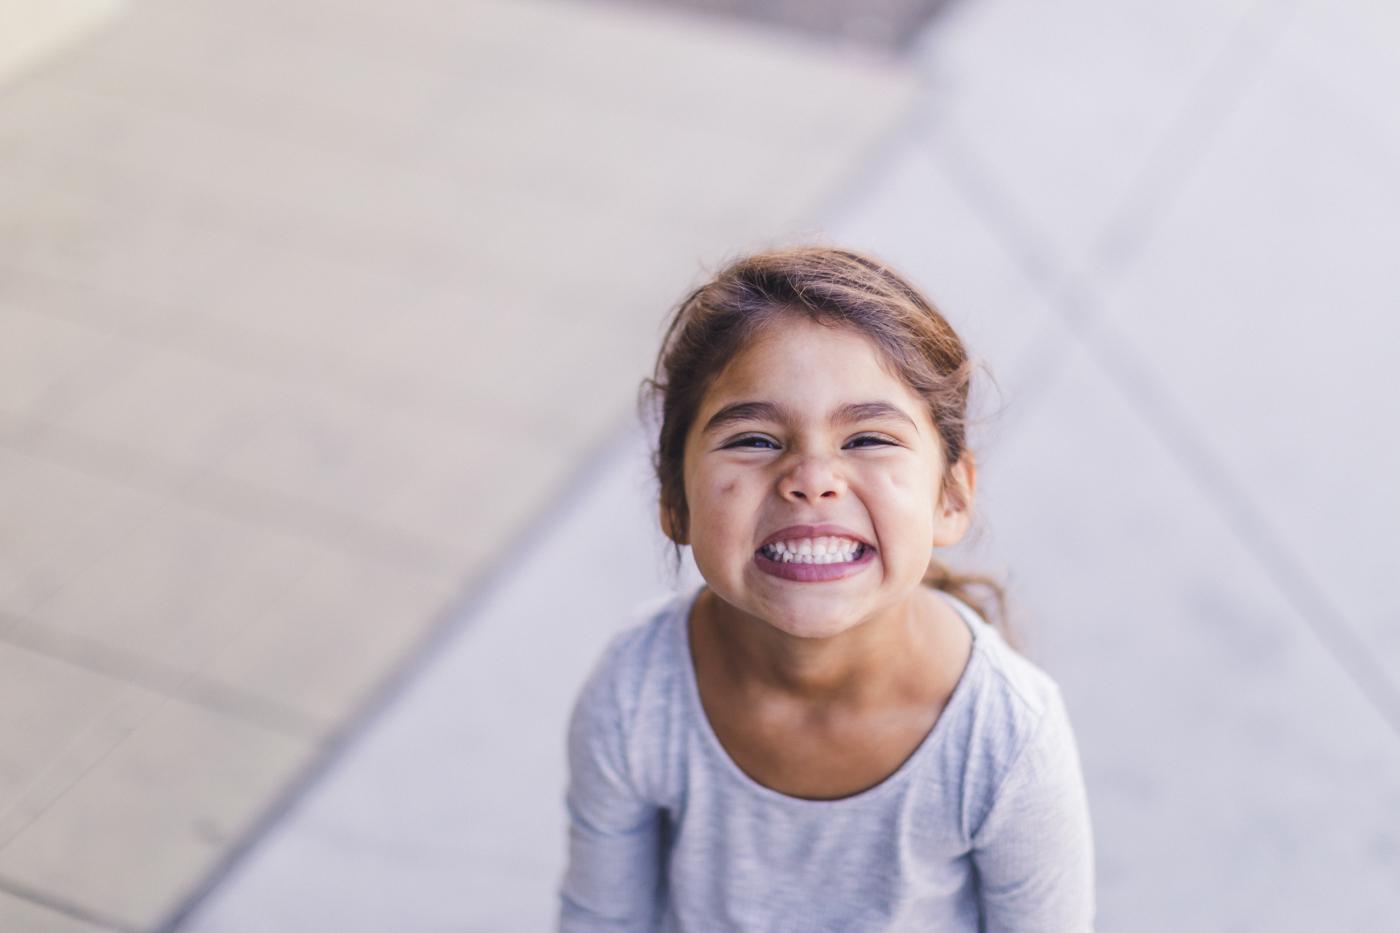 happy-daughter-smiling